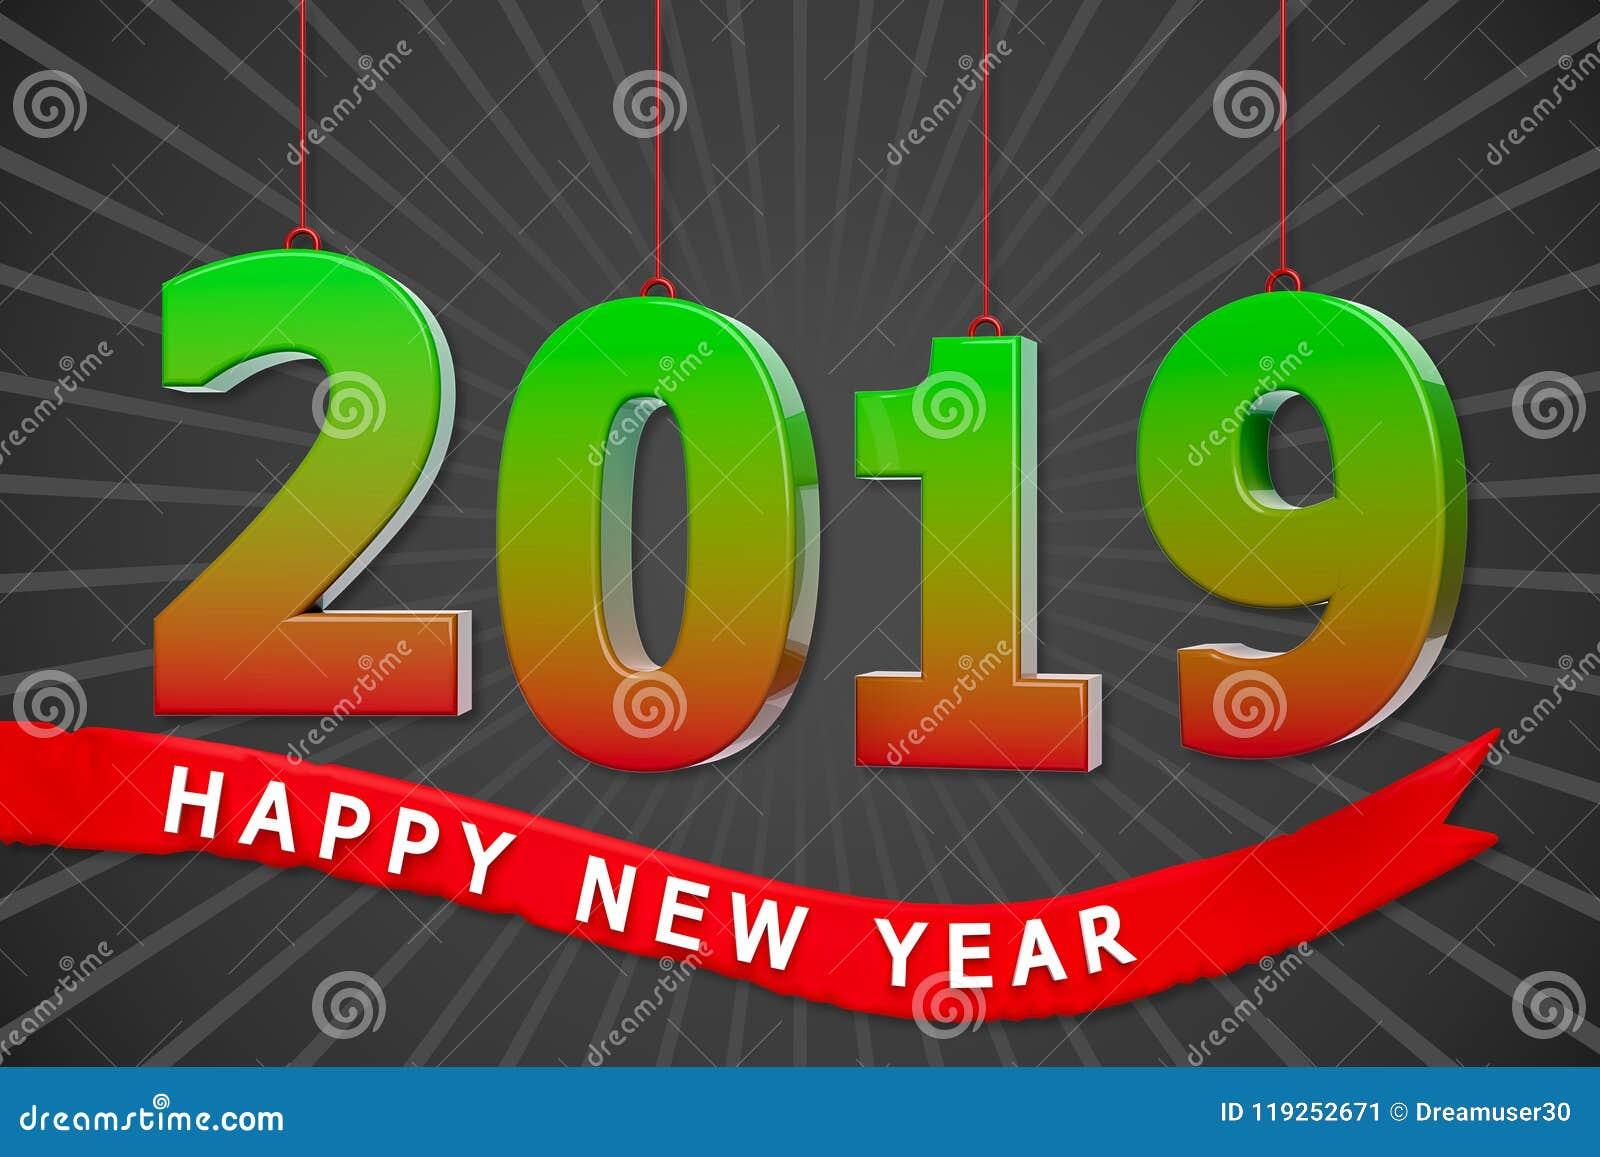 3d 2019 New Year Greetings Stock Illustration Illustration Of